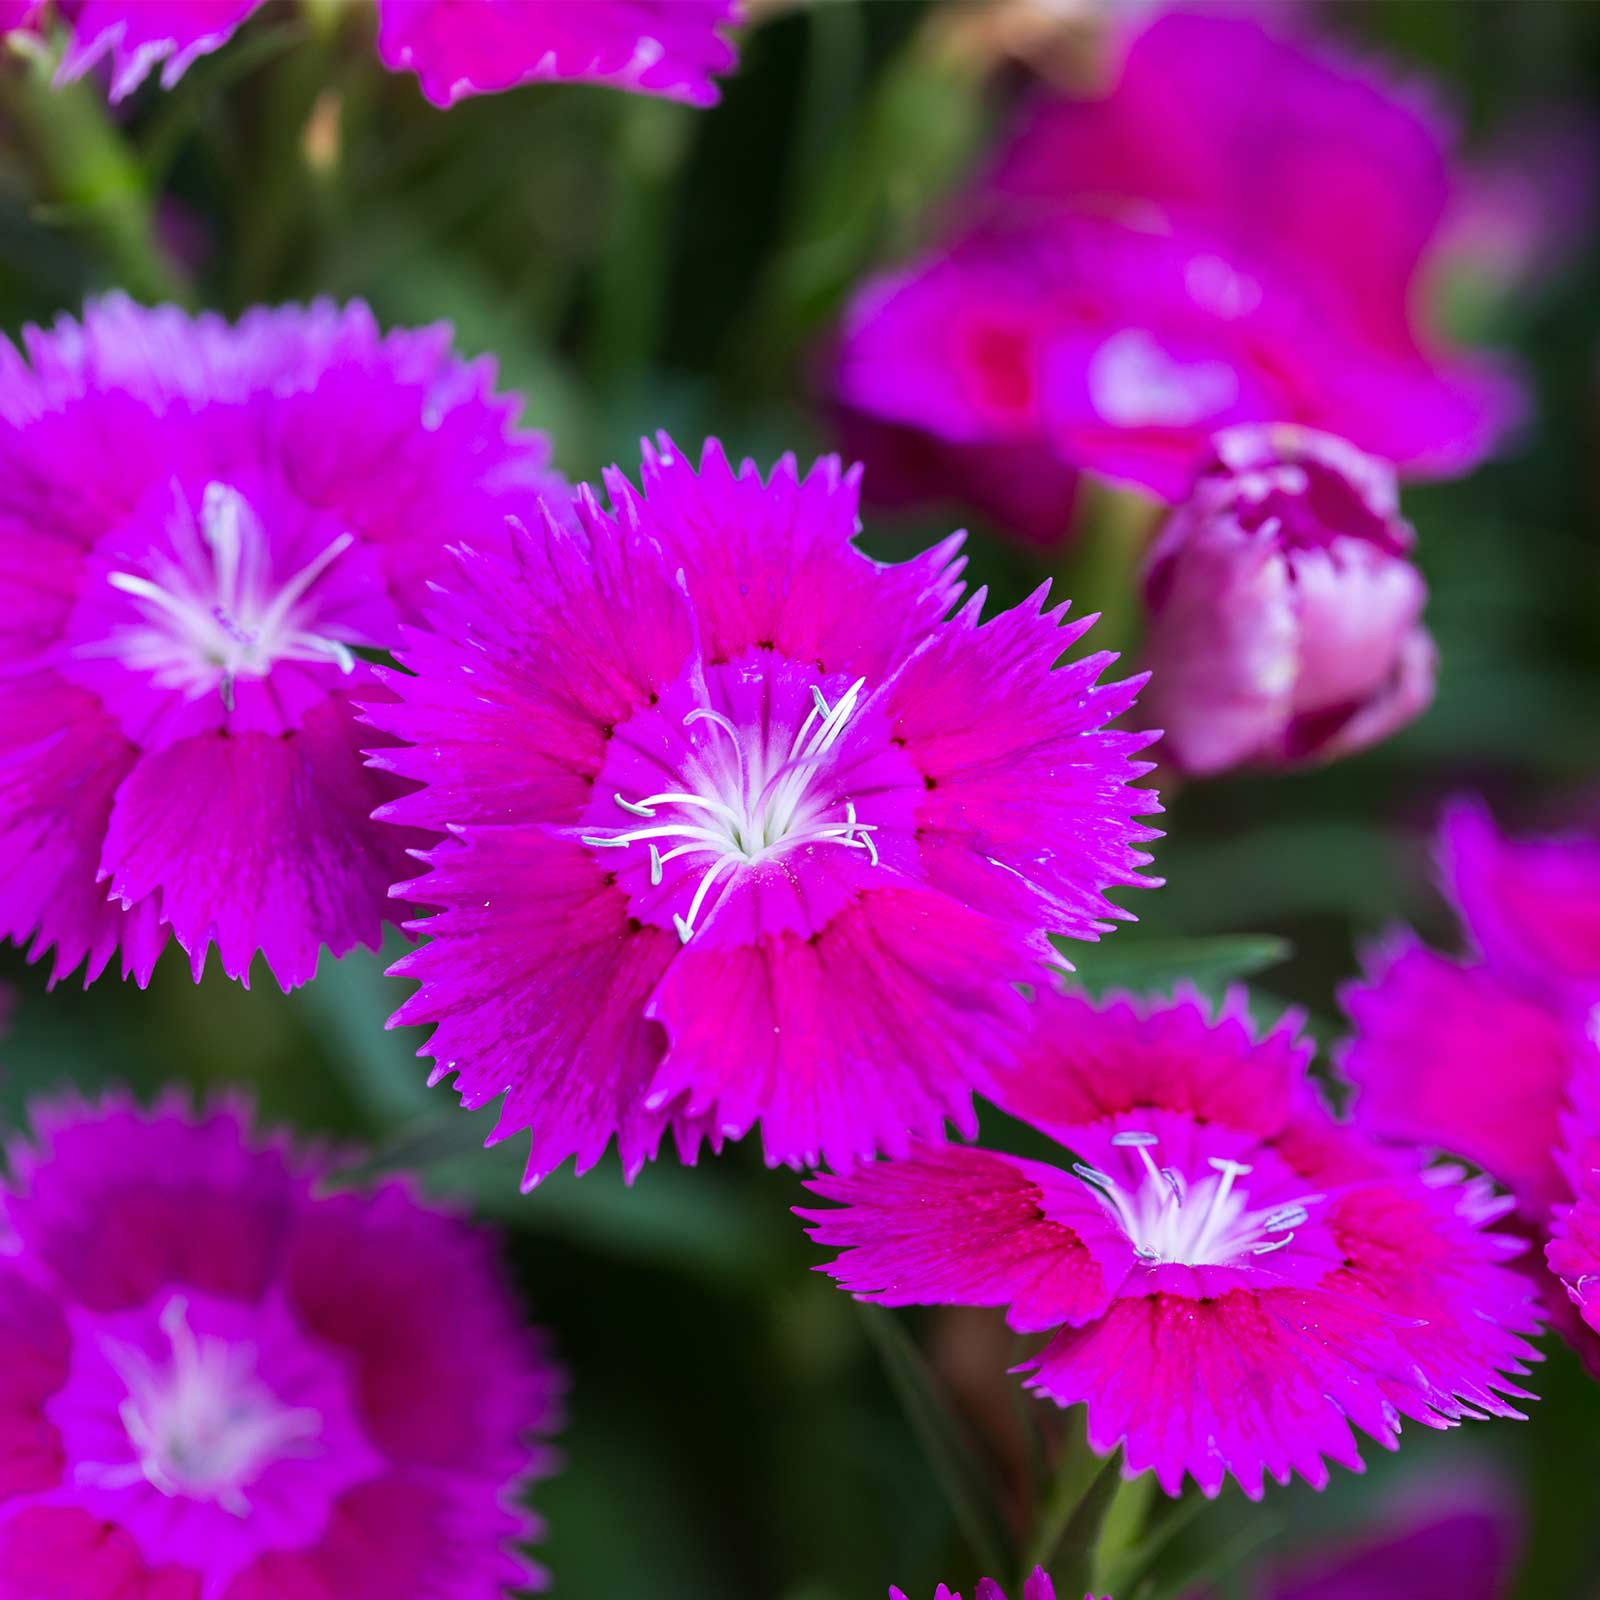 Dianthus Floral Lace Series Flower Seeds - Lilac - 100 Seeds - Annual Flower Garden Seeds - Dianthus chinensis x barbatus